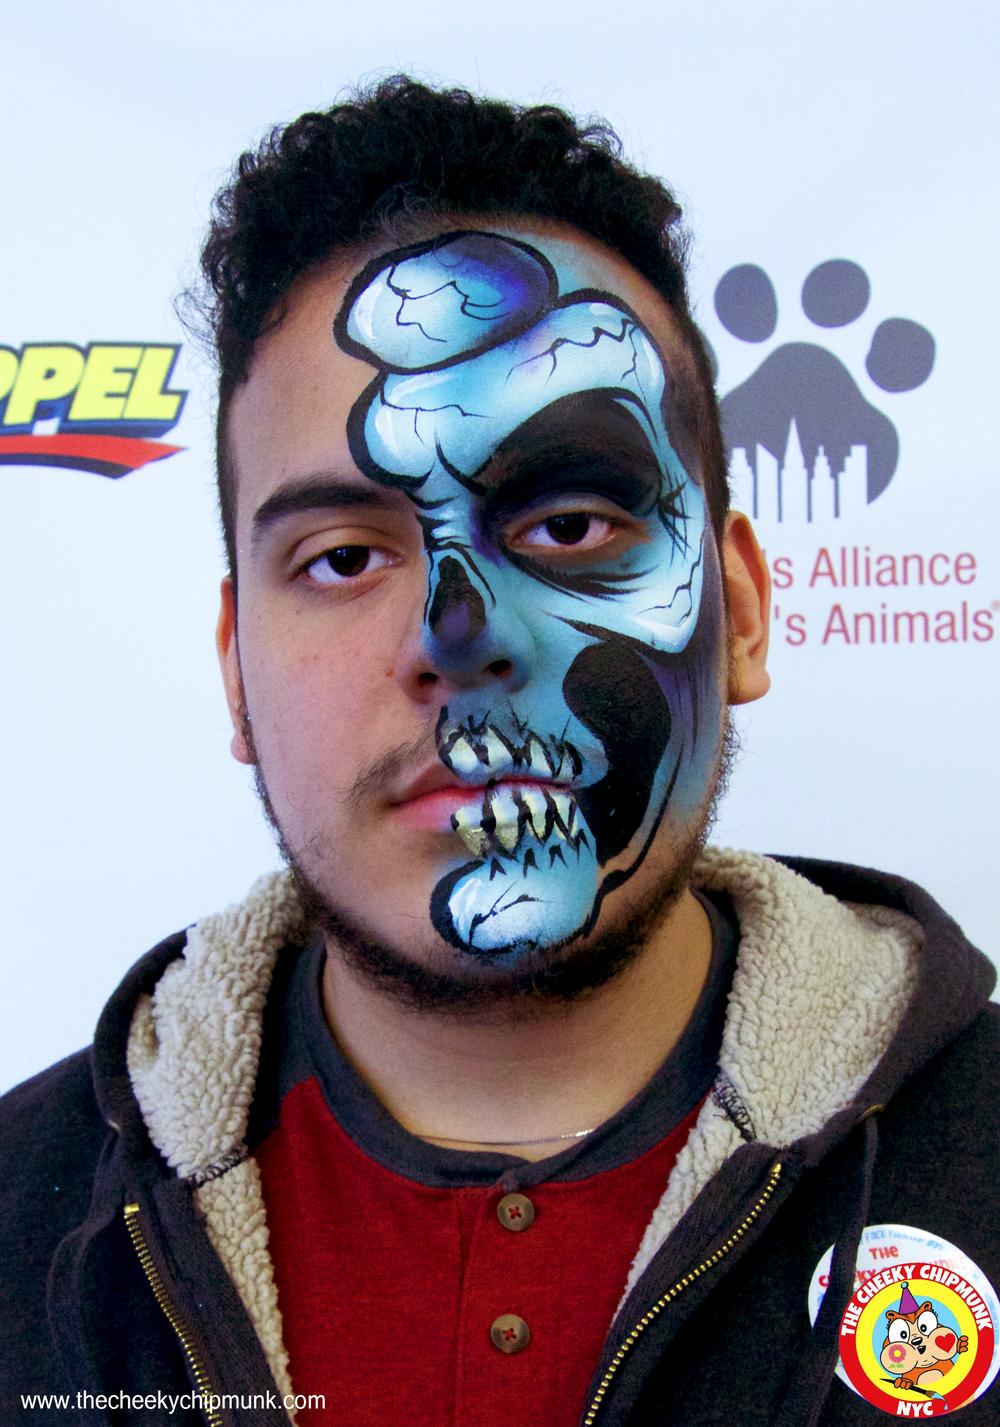 adoptapalooza may 22 2016 adult ronnie mena half skull man.jpg